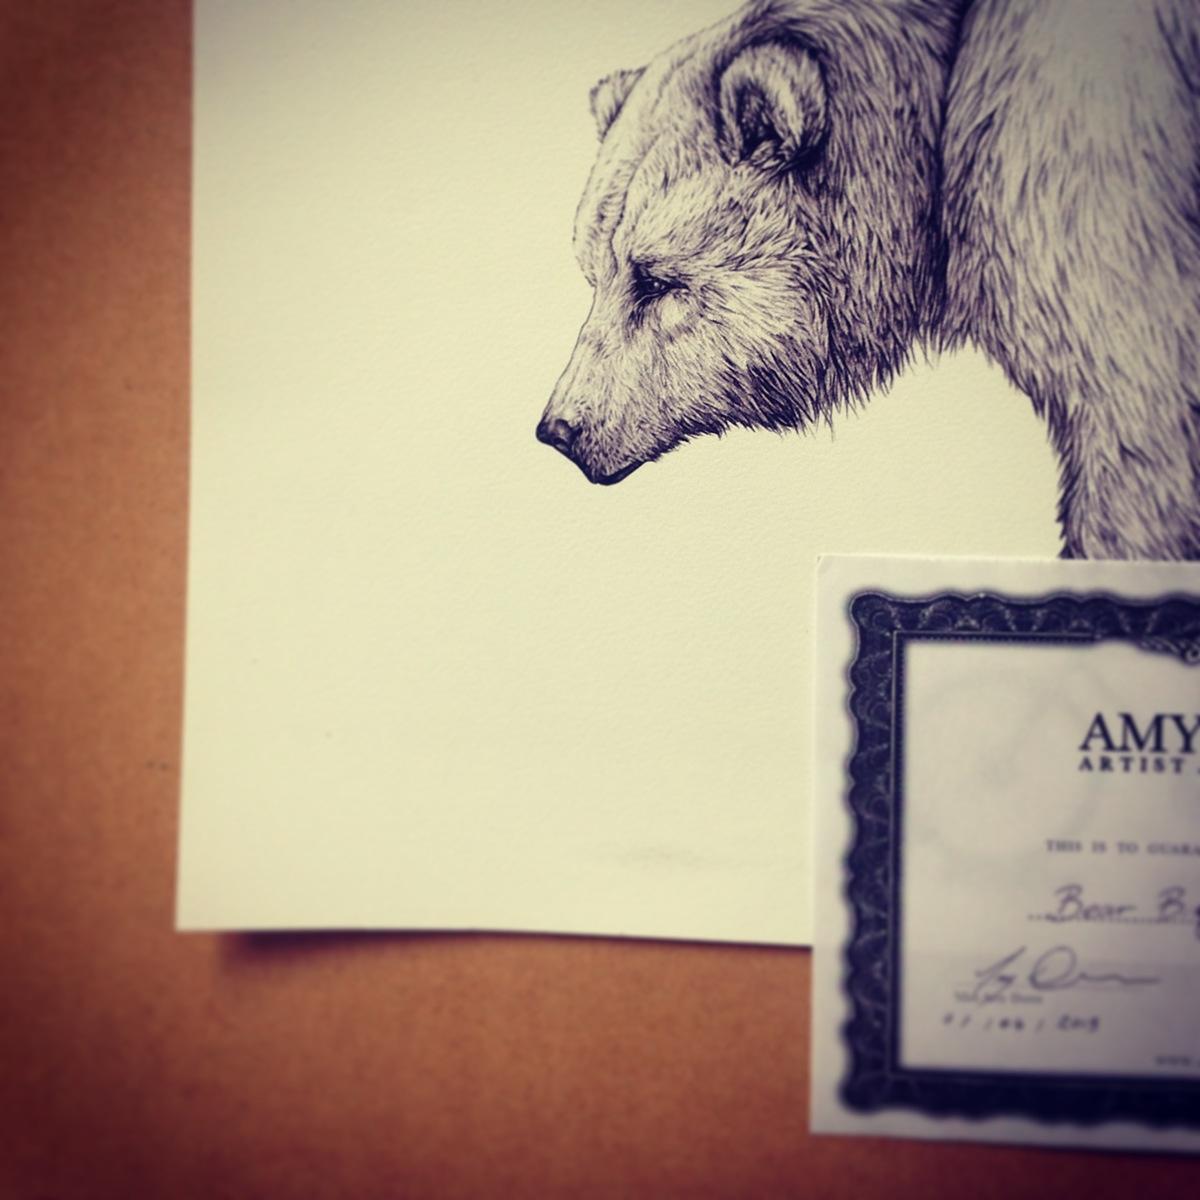 bear hare Bike Cycling sport hair animal funny comedic sad print card greetings gift